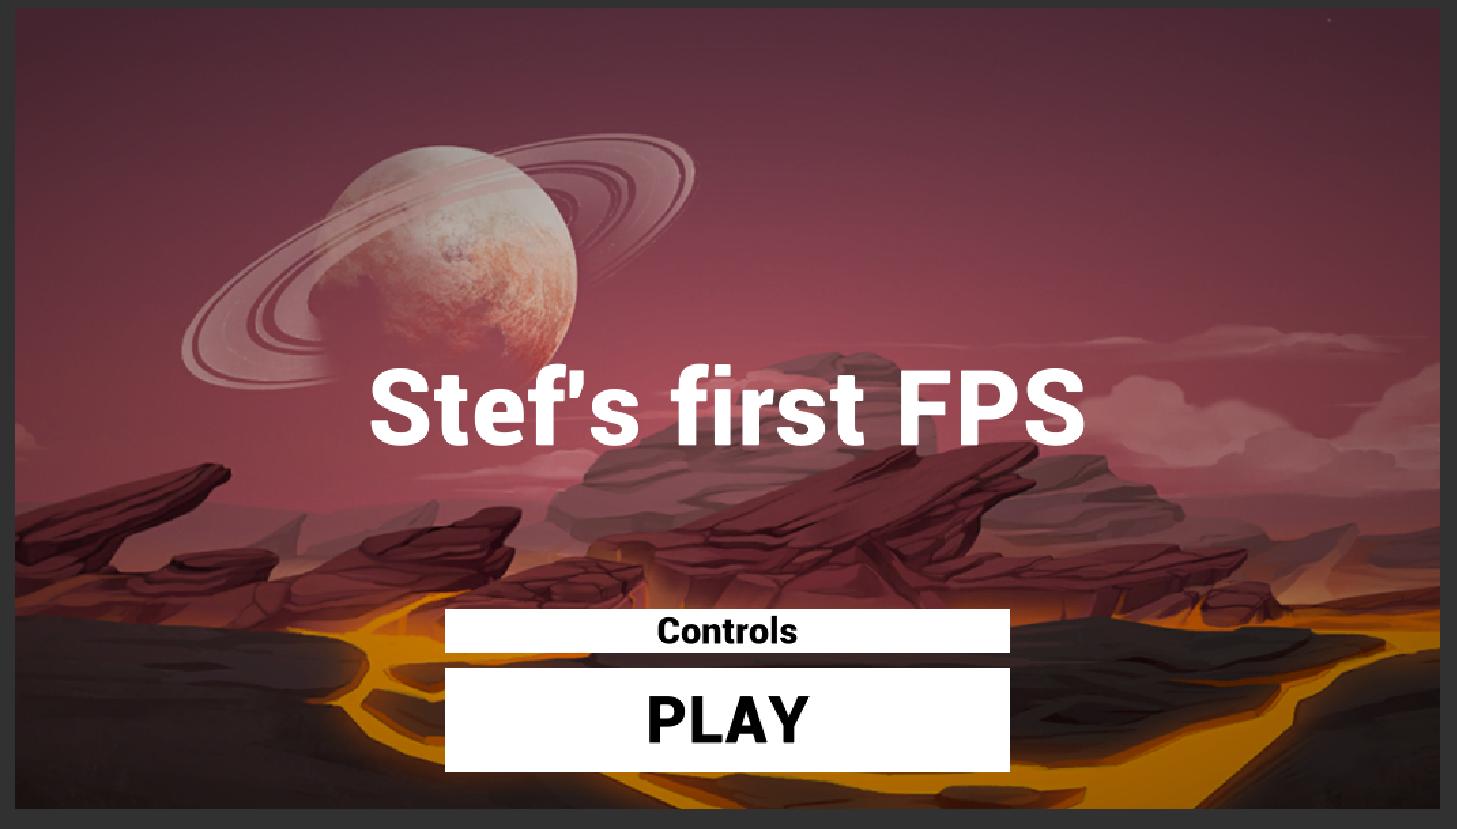 Stef's first FPS